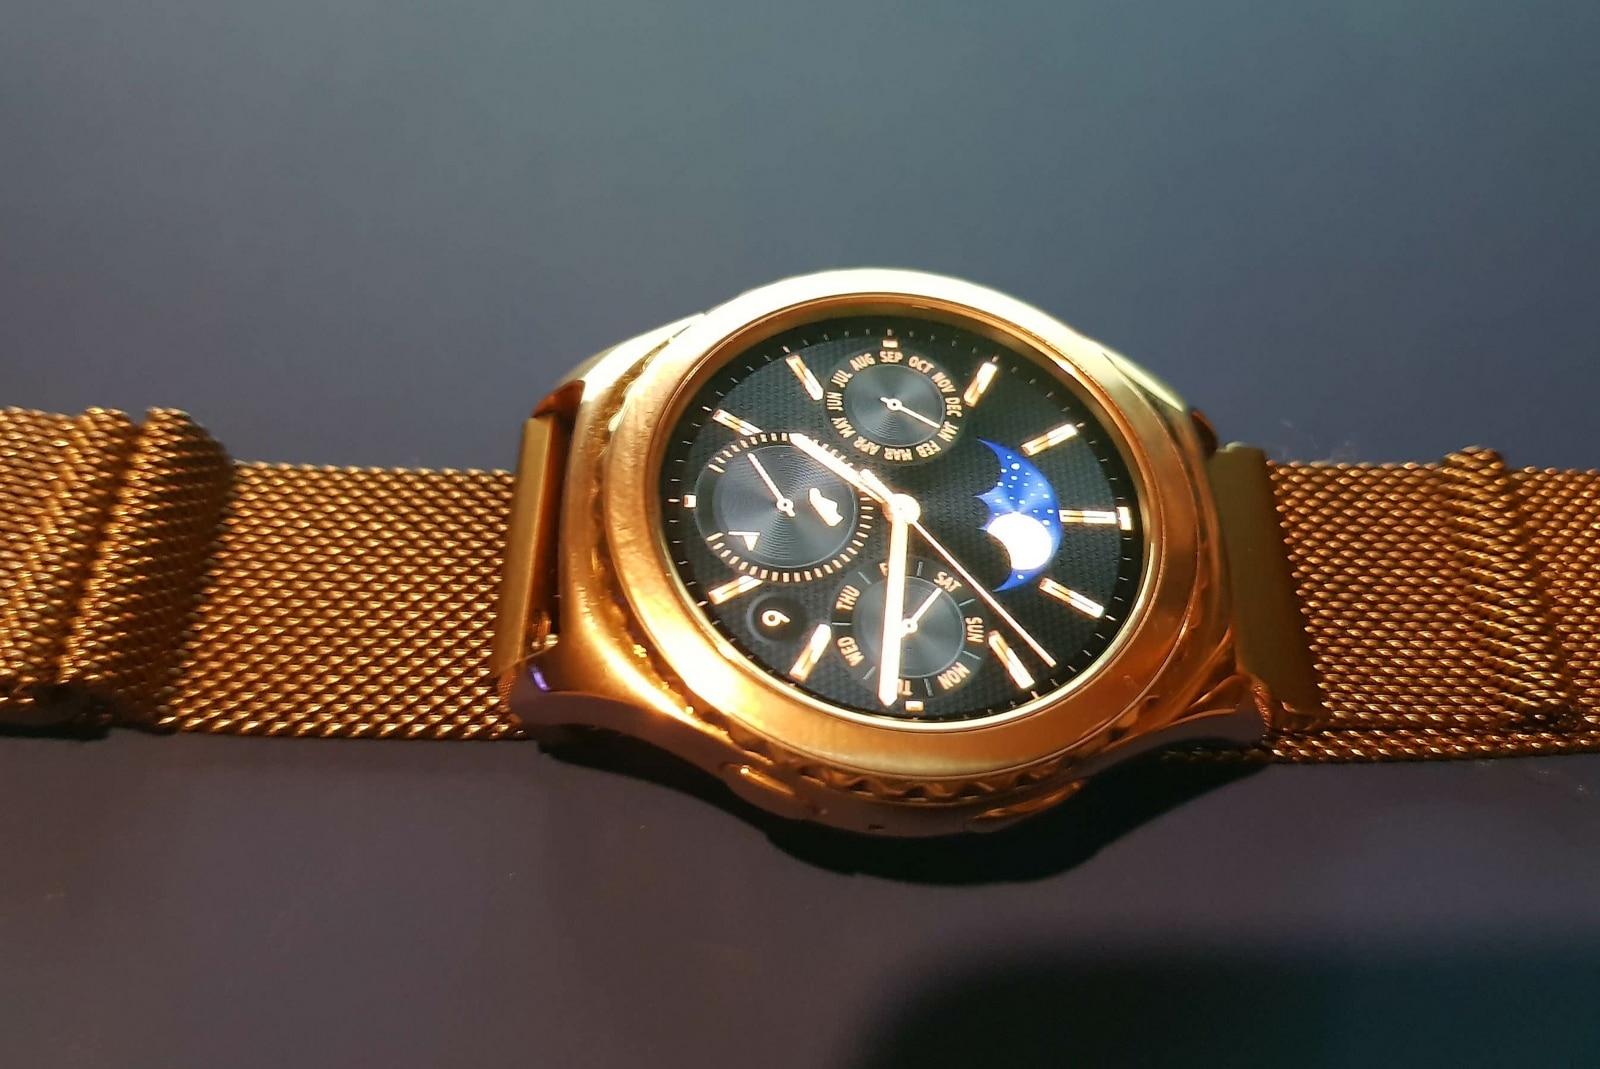 Samsung Gear S2 Classic Rose Gold watch